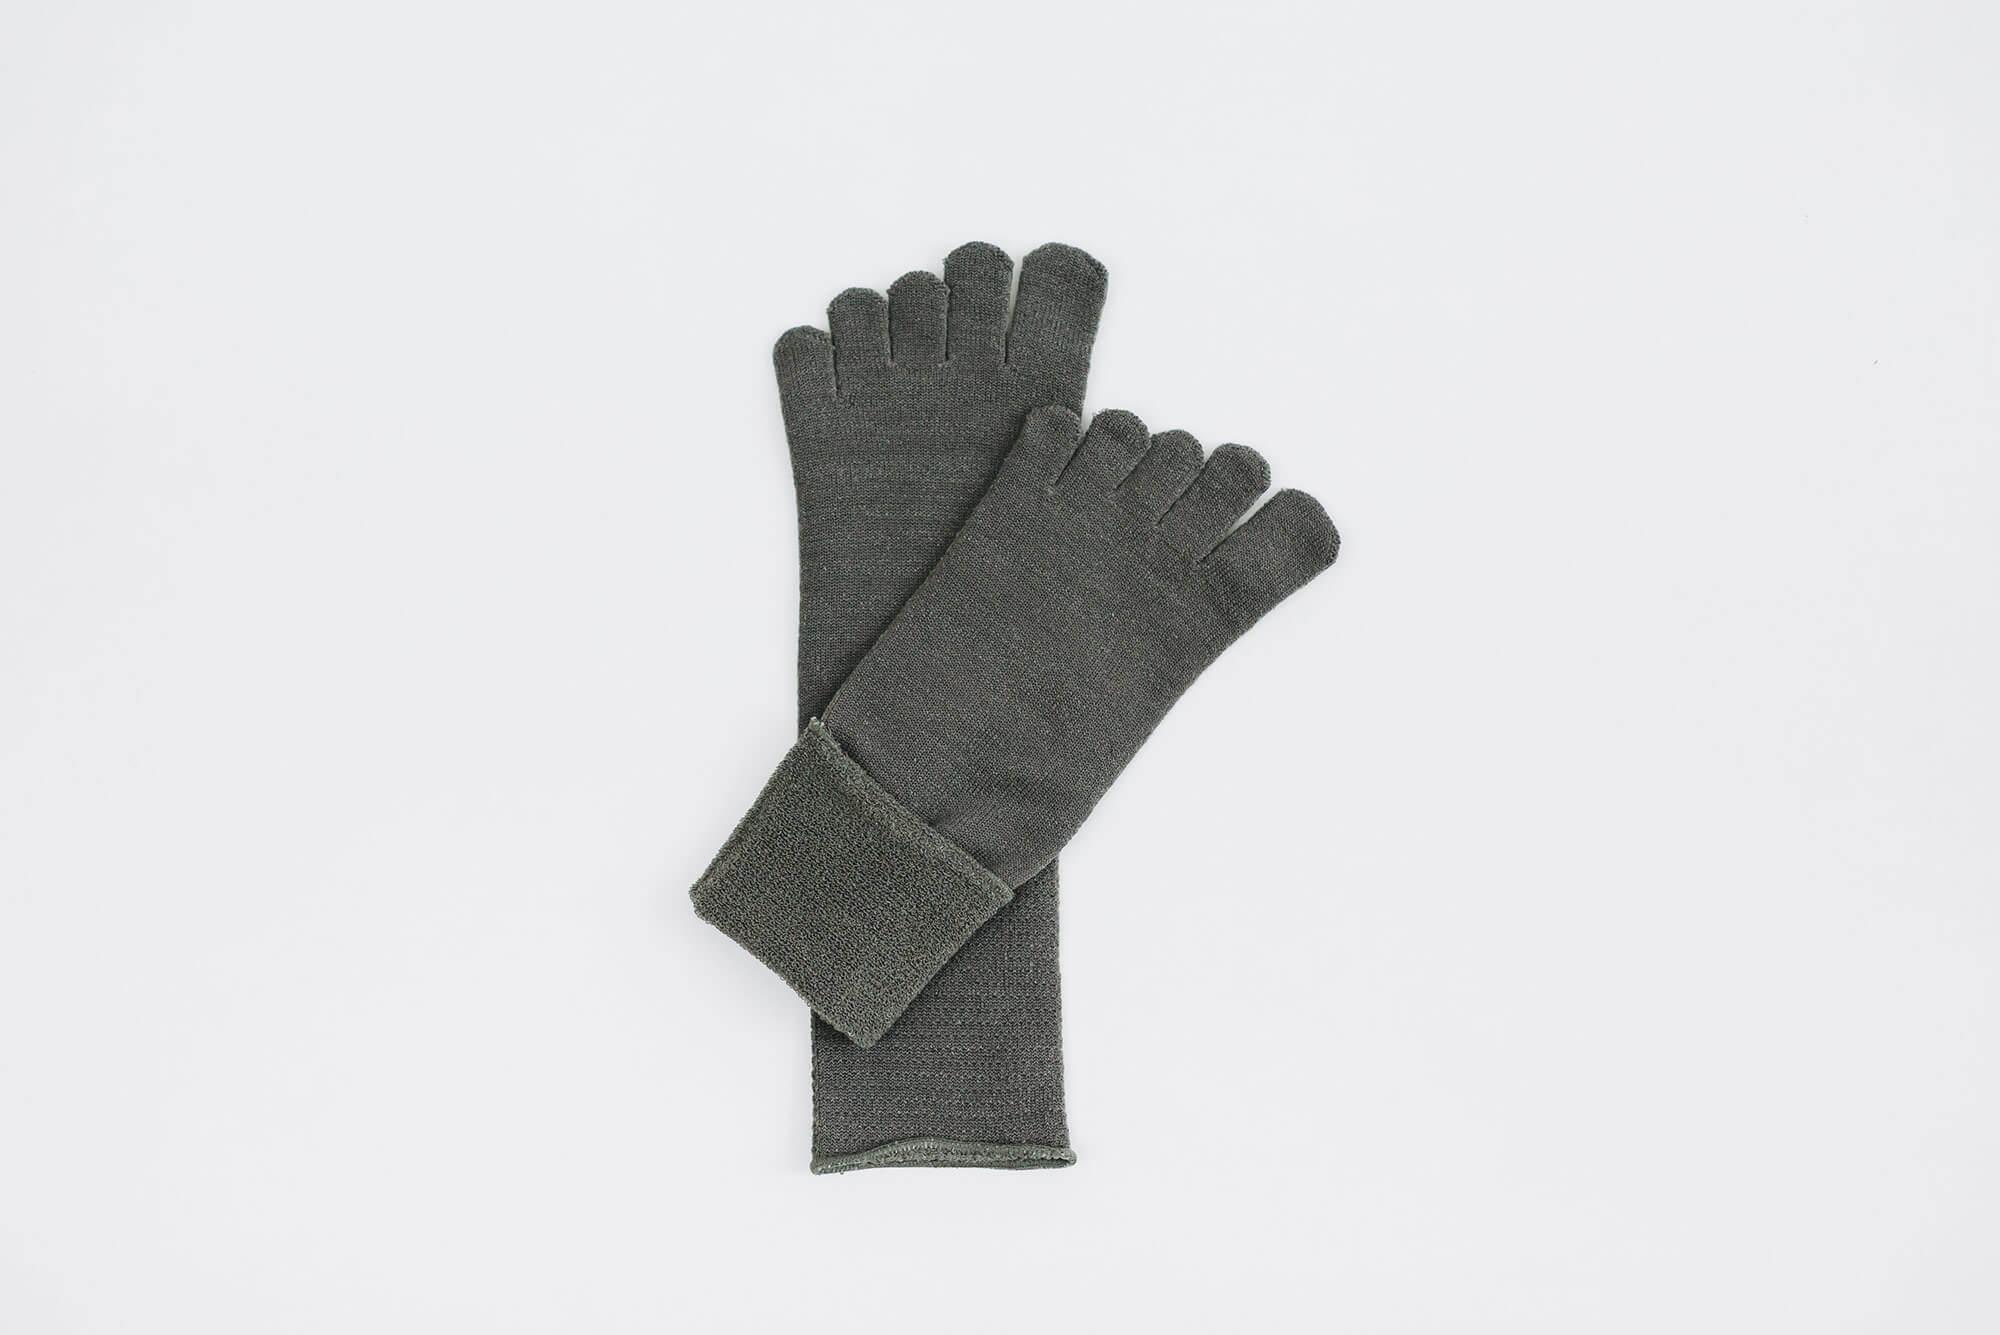 Glück und Gute 五本指「足の肌着」絹とウール